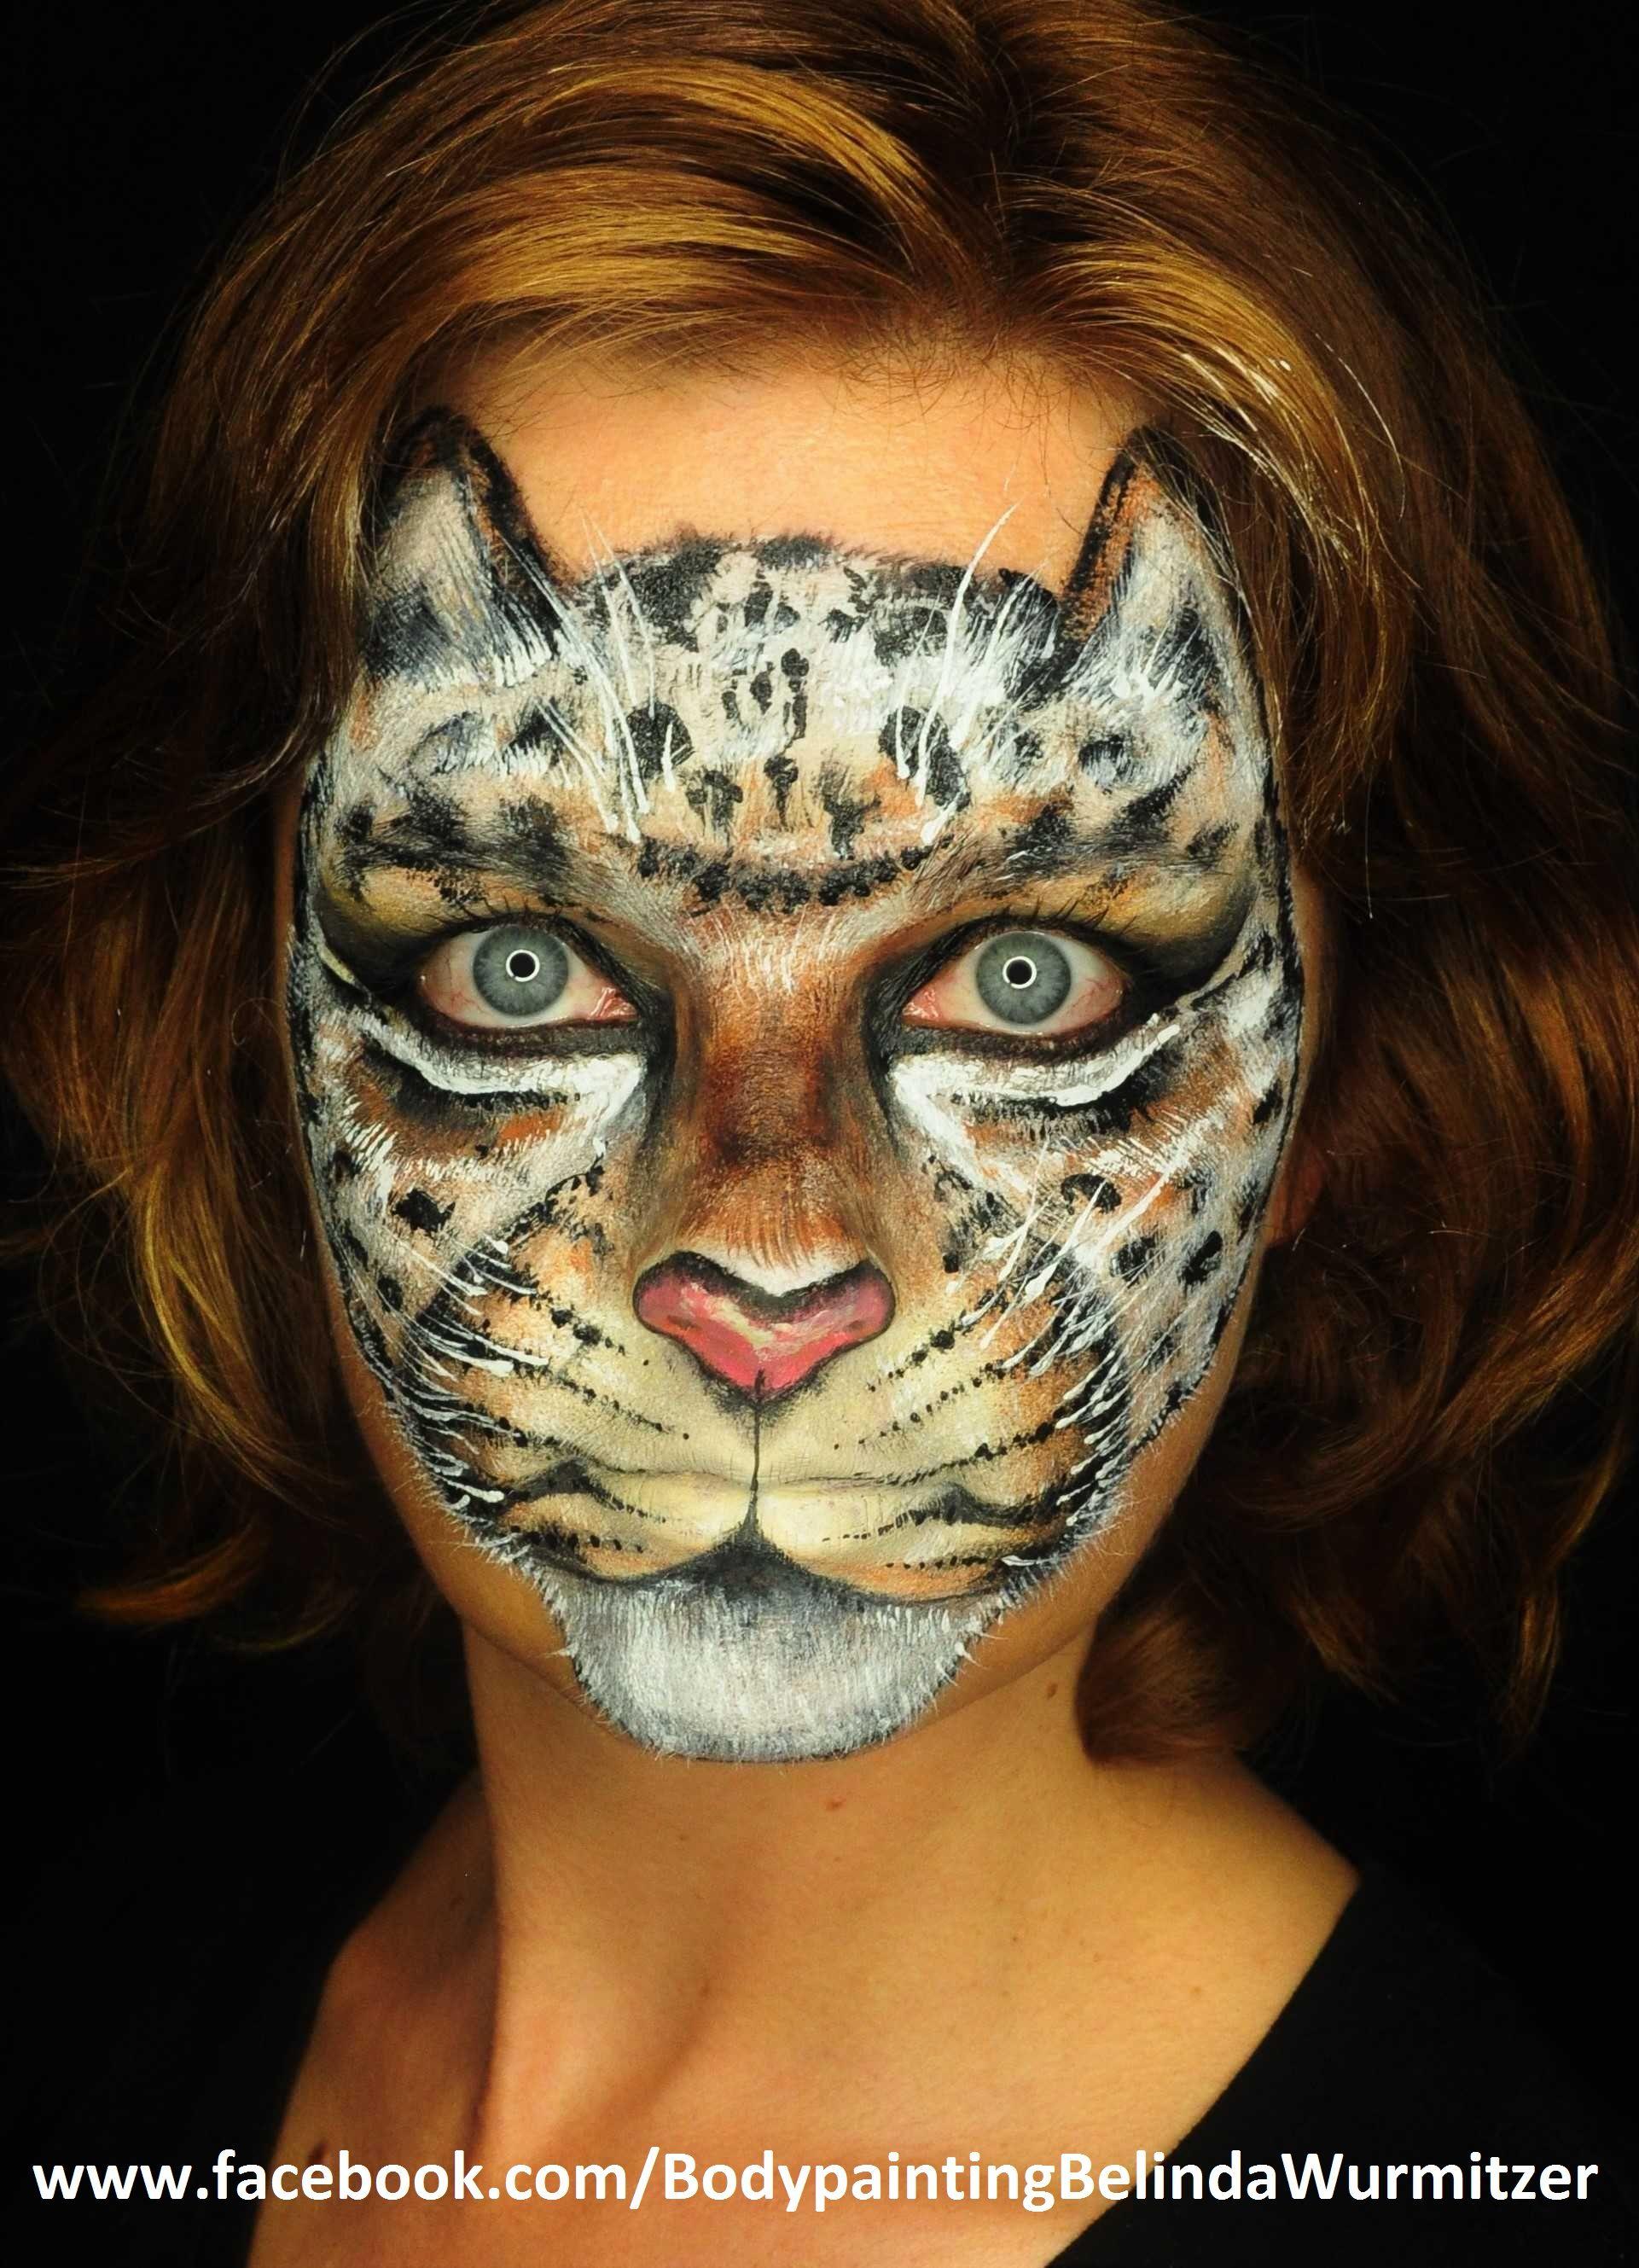 leopard artist und artist belinda wurmitzer kinderschminken facepainting pinterest. Black Bedroom Furniture Sets. Home Design Ideas